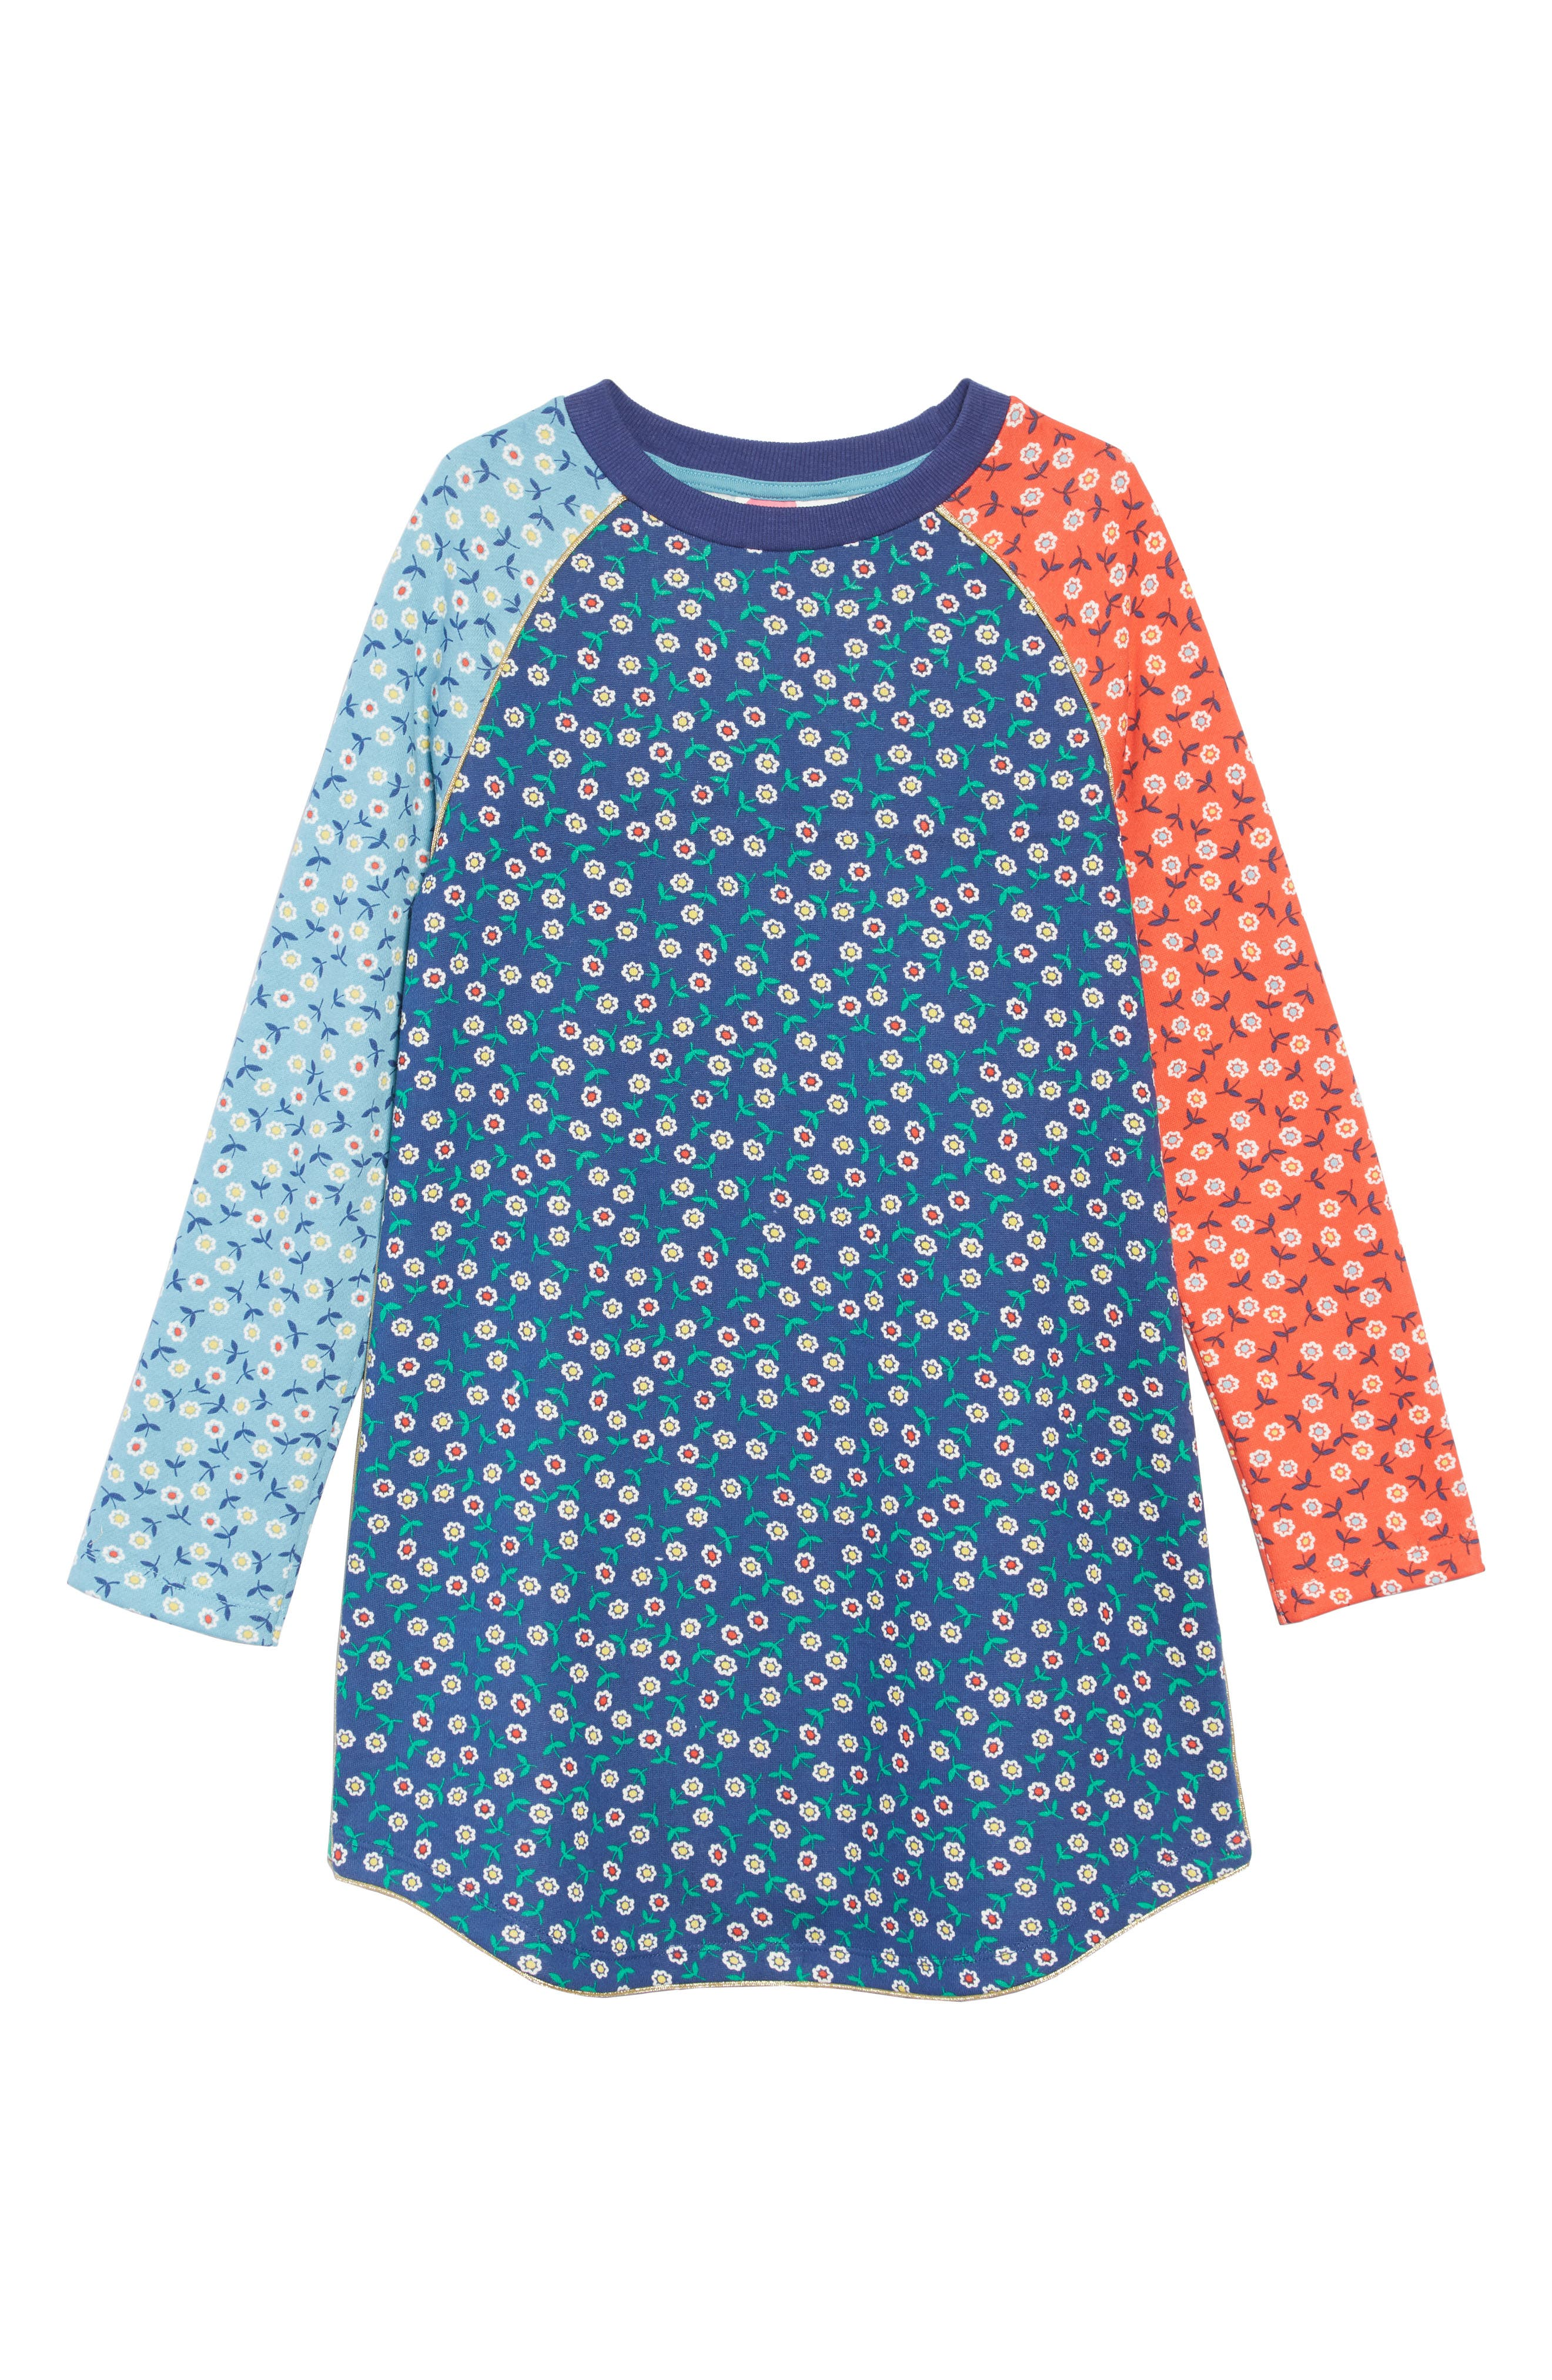 Cozy Sweatshirt Dress,                             Main thumbnail 1, color,                             Multi Retro Daisies